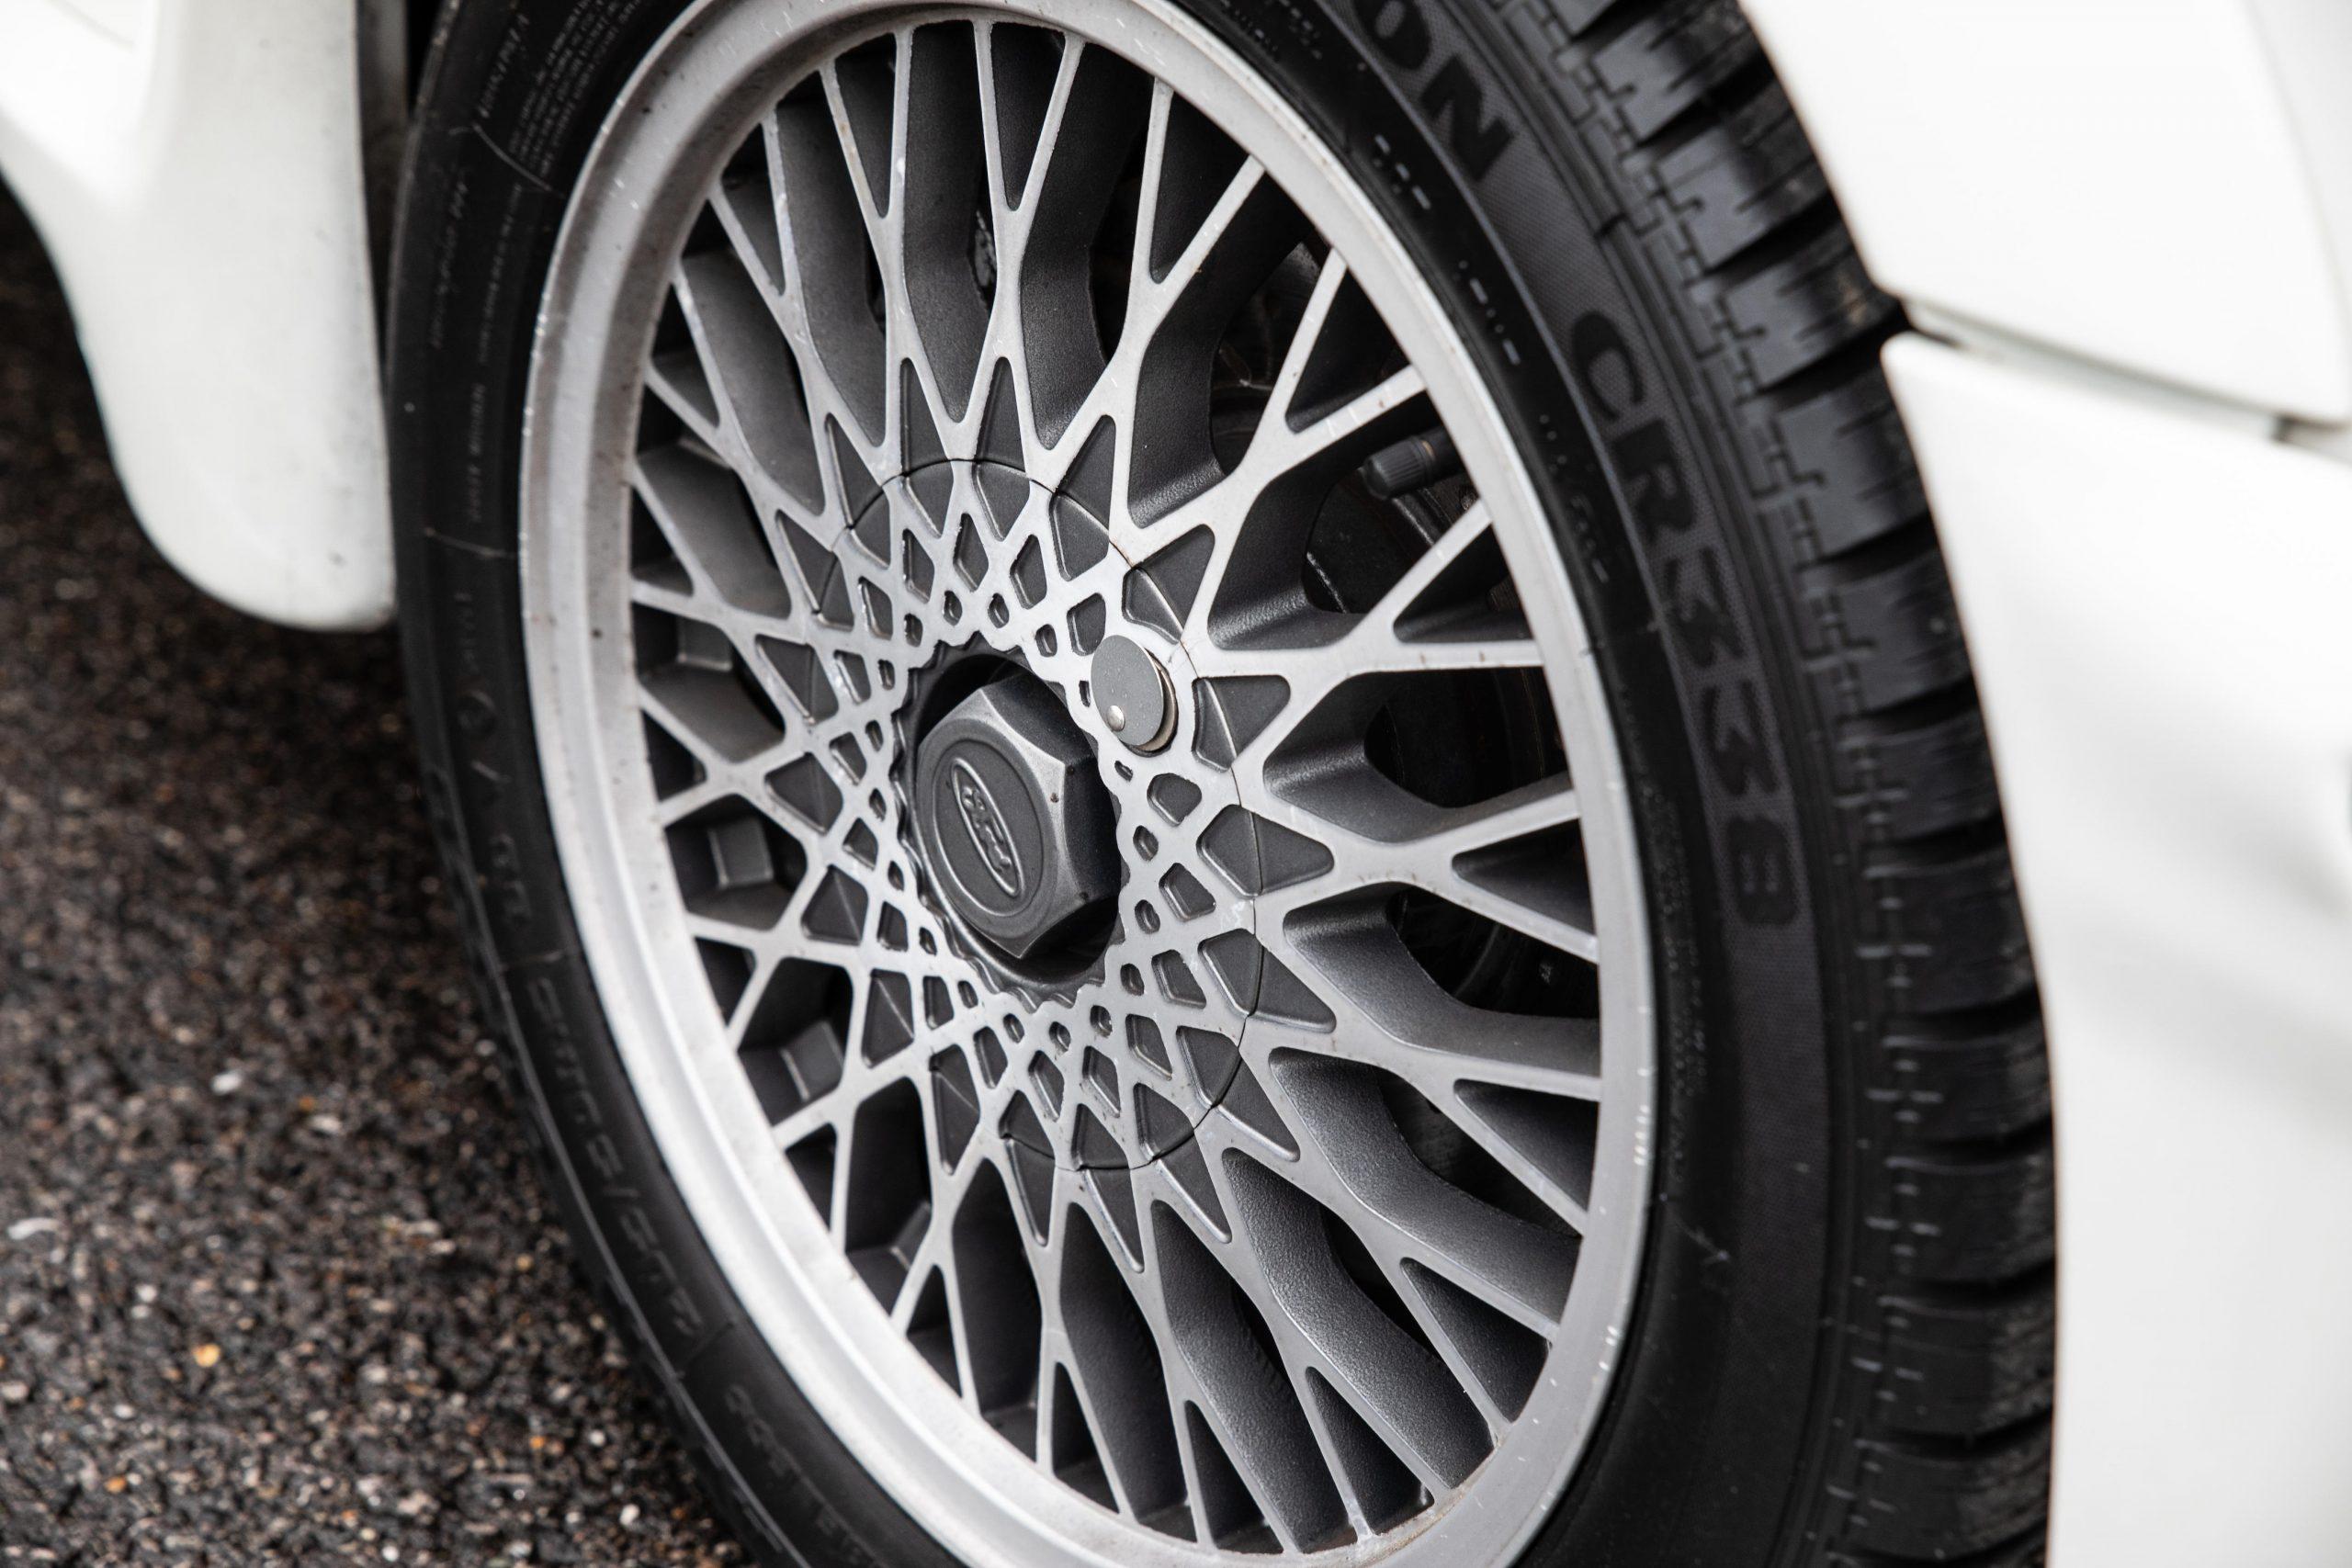 1987 Ford Sierra RS Cosworth Wheel